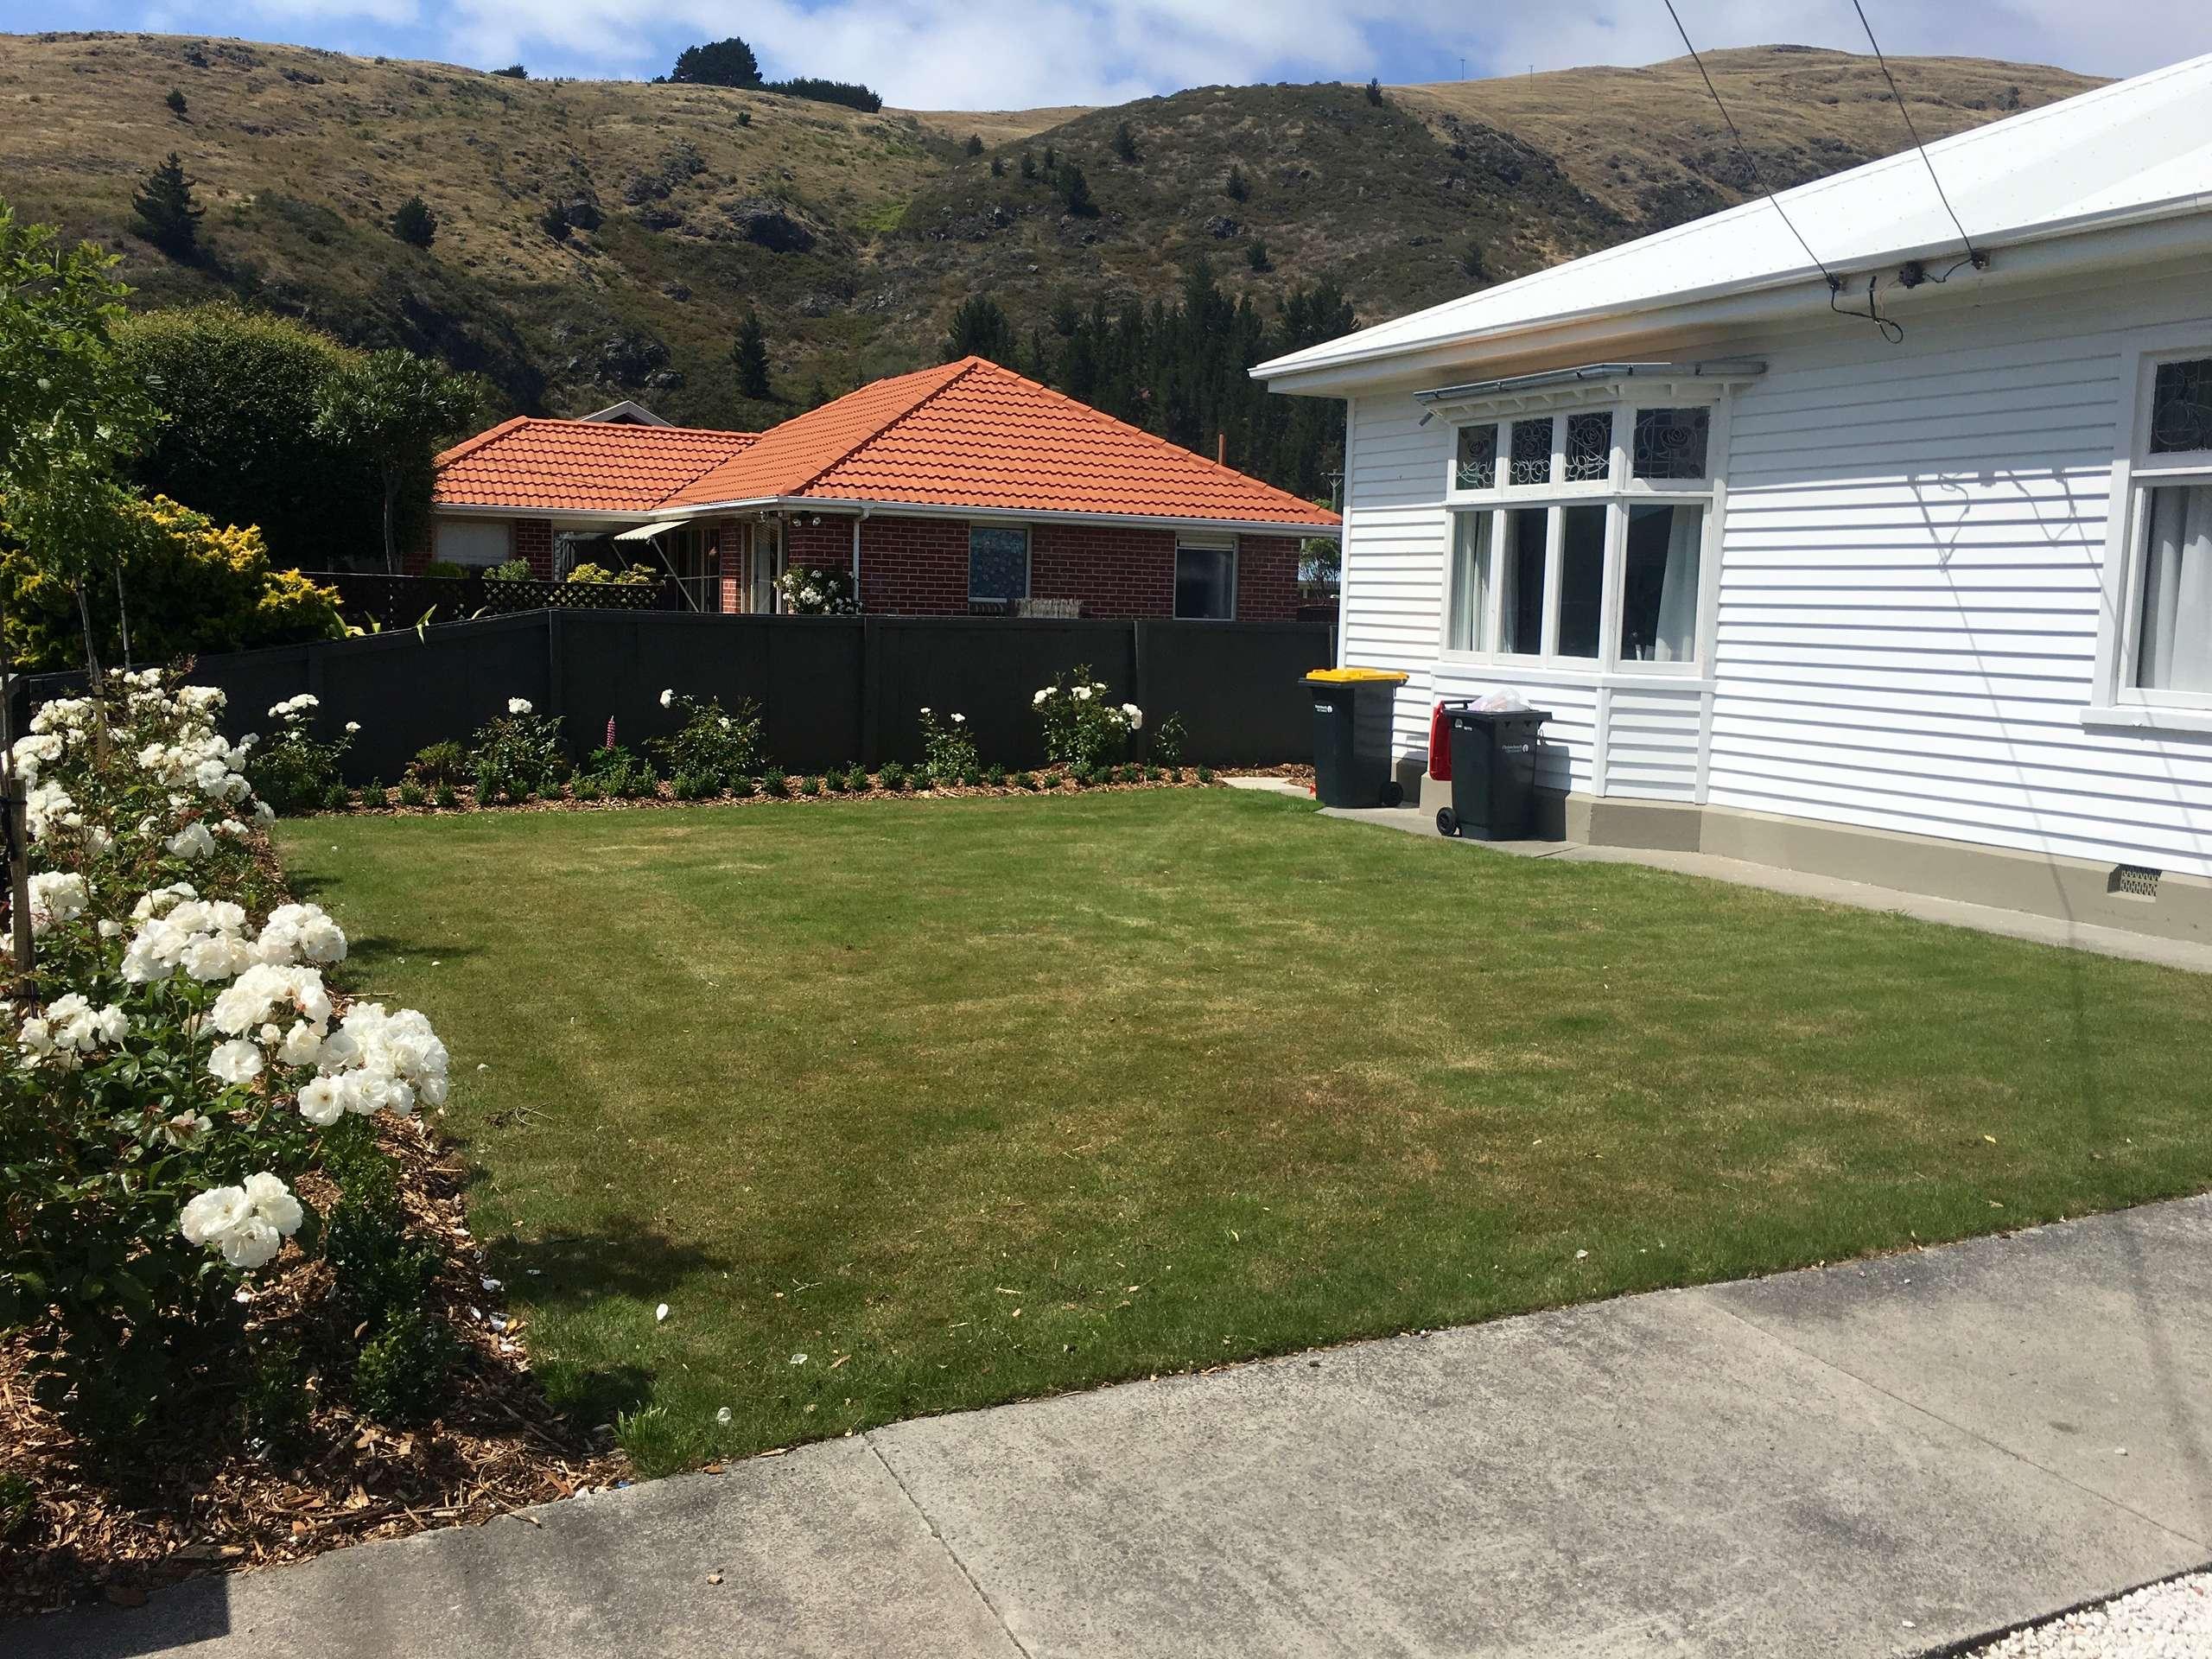 40 Arnold Street, Sumner, Christchurch City 8081